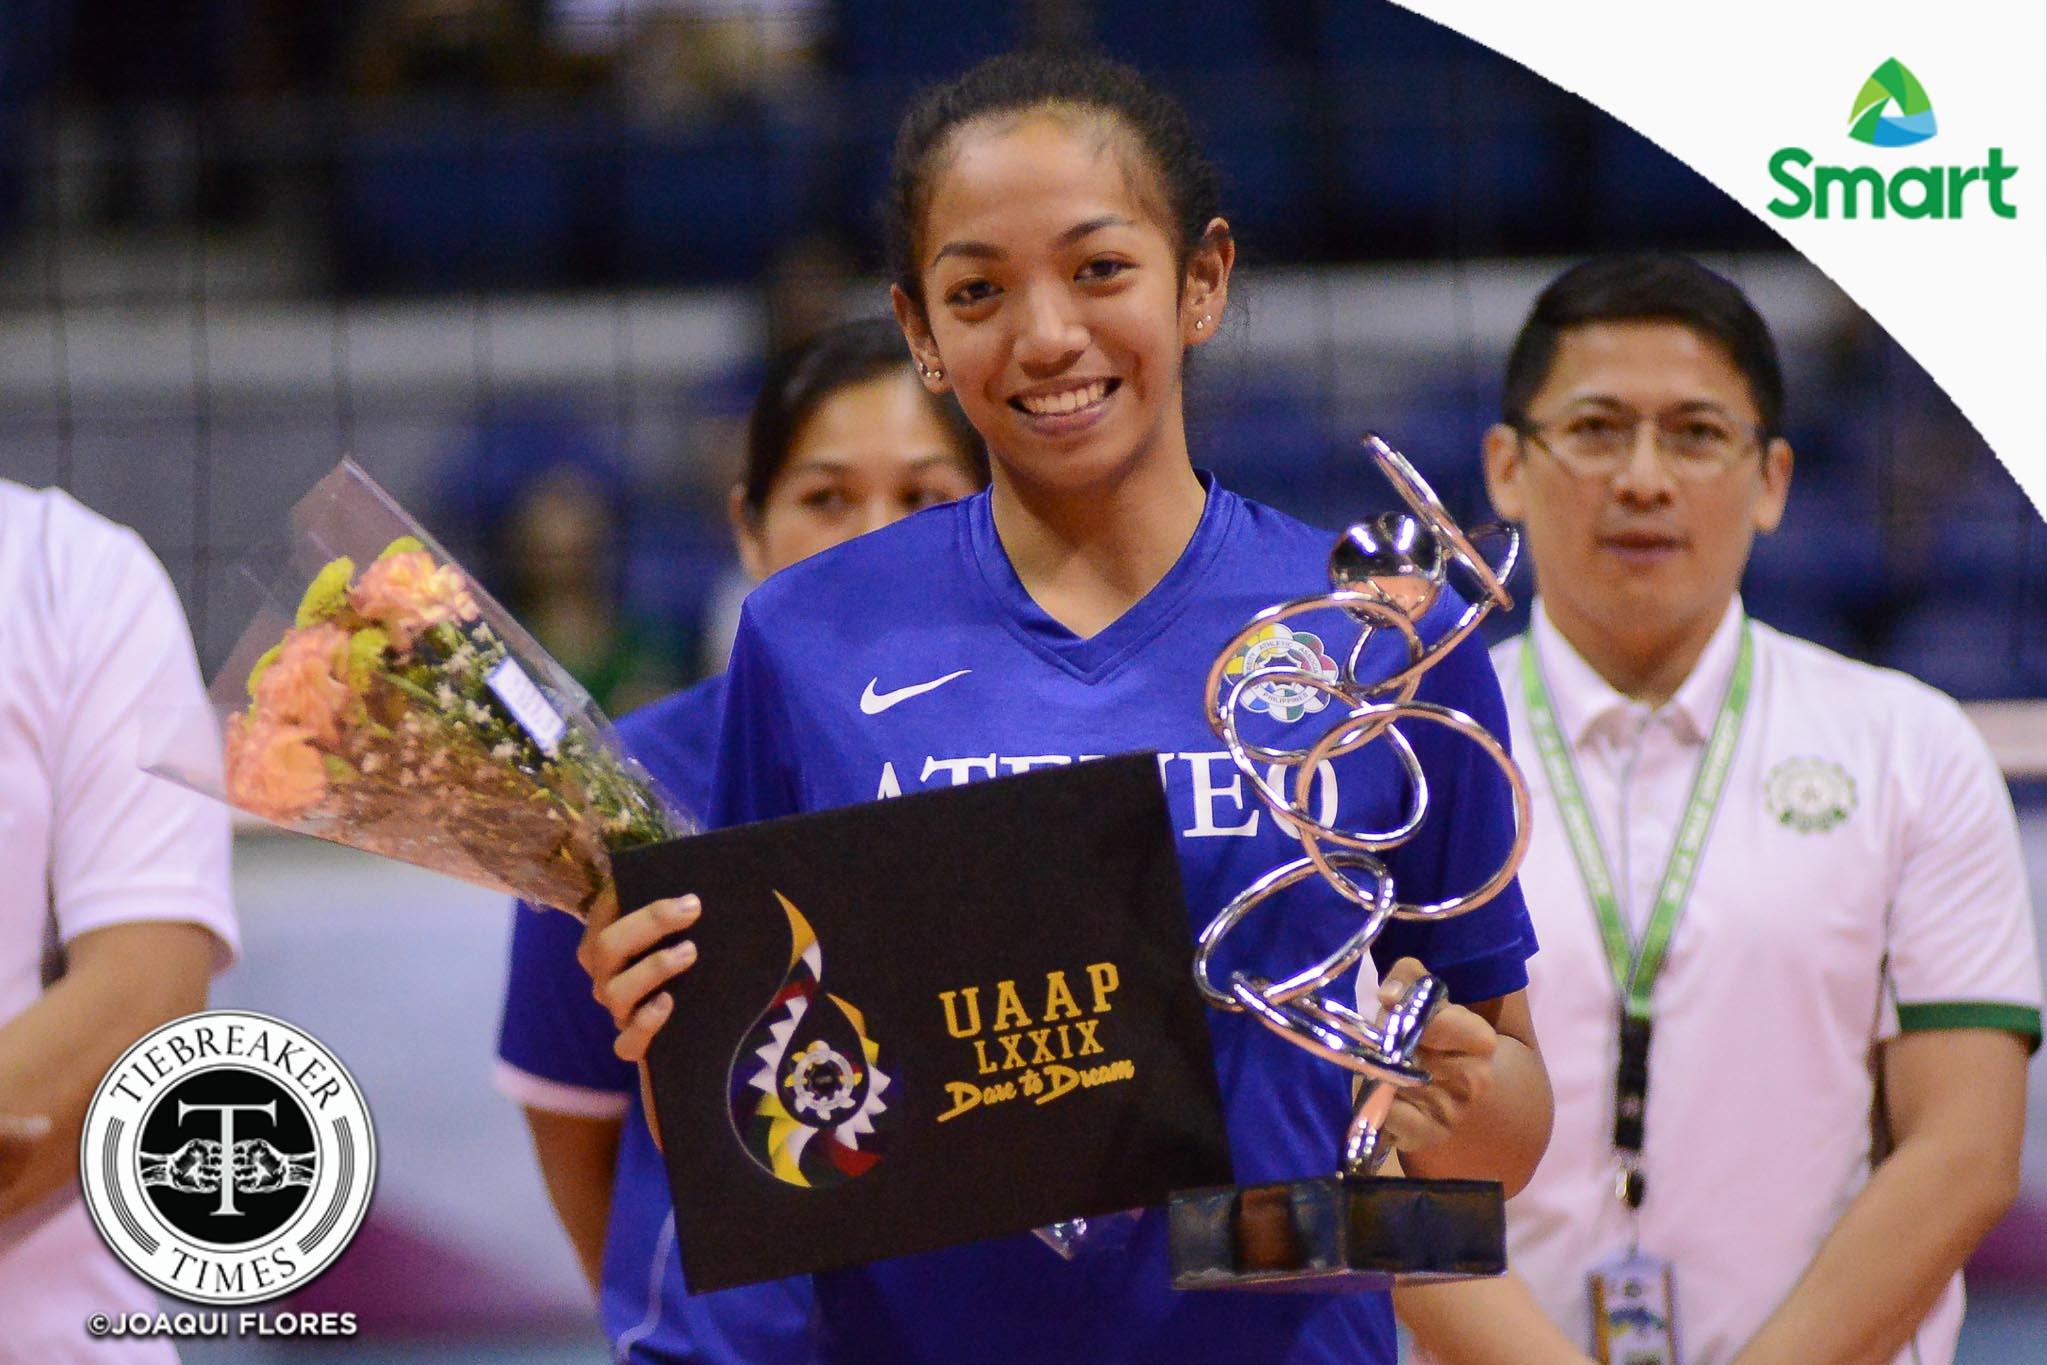 UAAP-79-Womens-Volleyball-Awarding-Samonte-6978 Jules Samonte bids Ateneo farewell: 'On to the next' ADMU News UAAP Volleyball  - philippine sports news